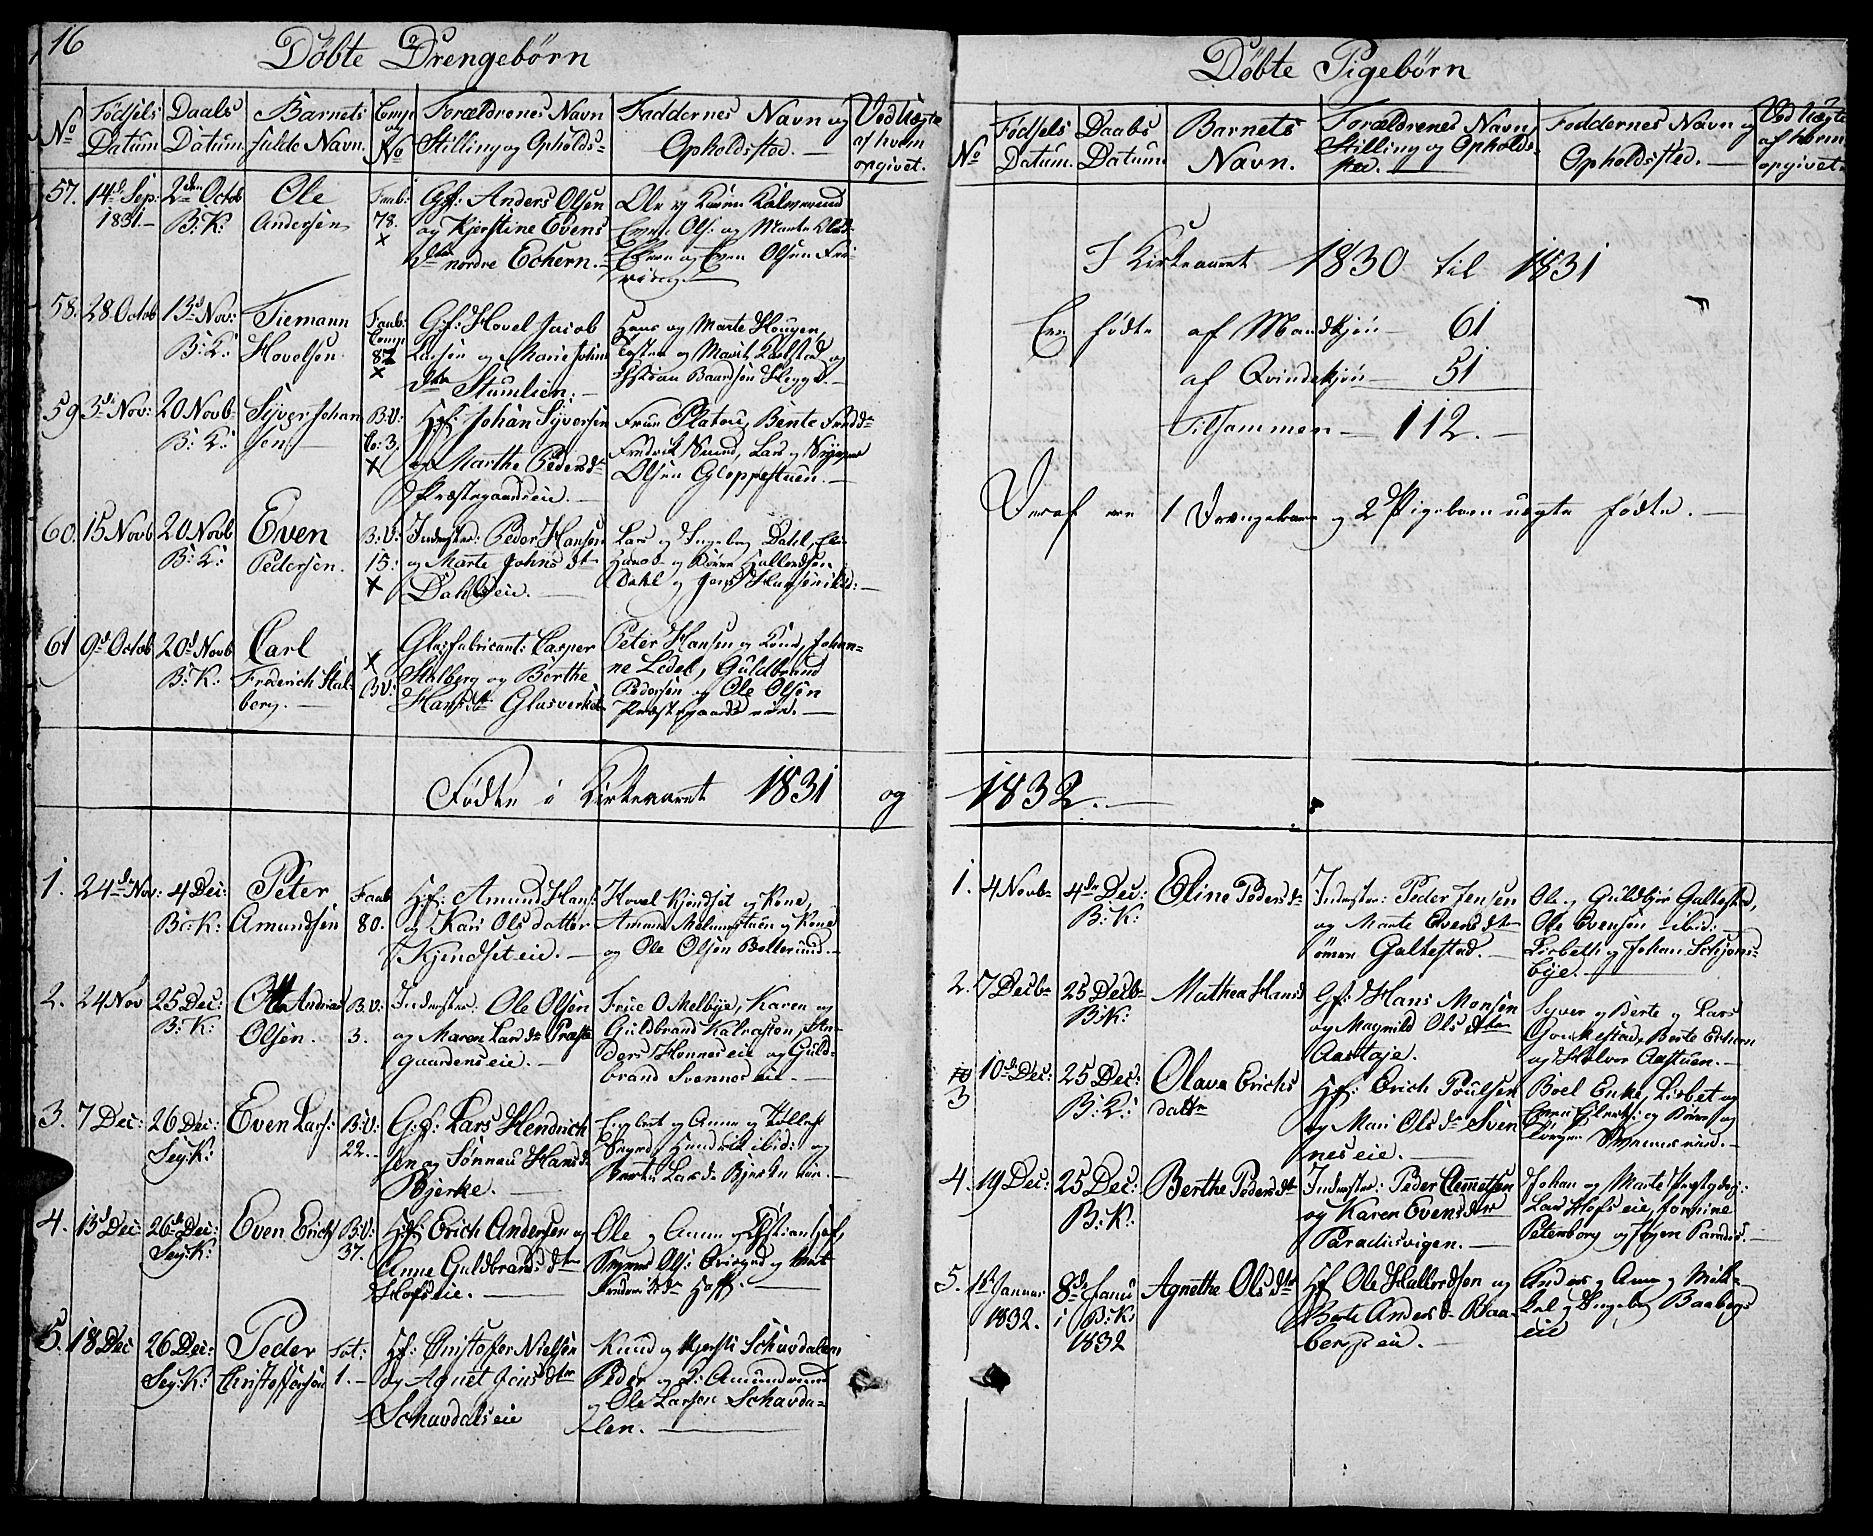 SAH, Biri prestekontor, Klokkerbok nr. 2, 1828-1842, s. 16